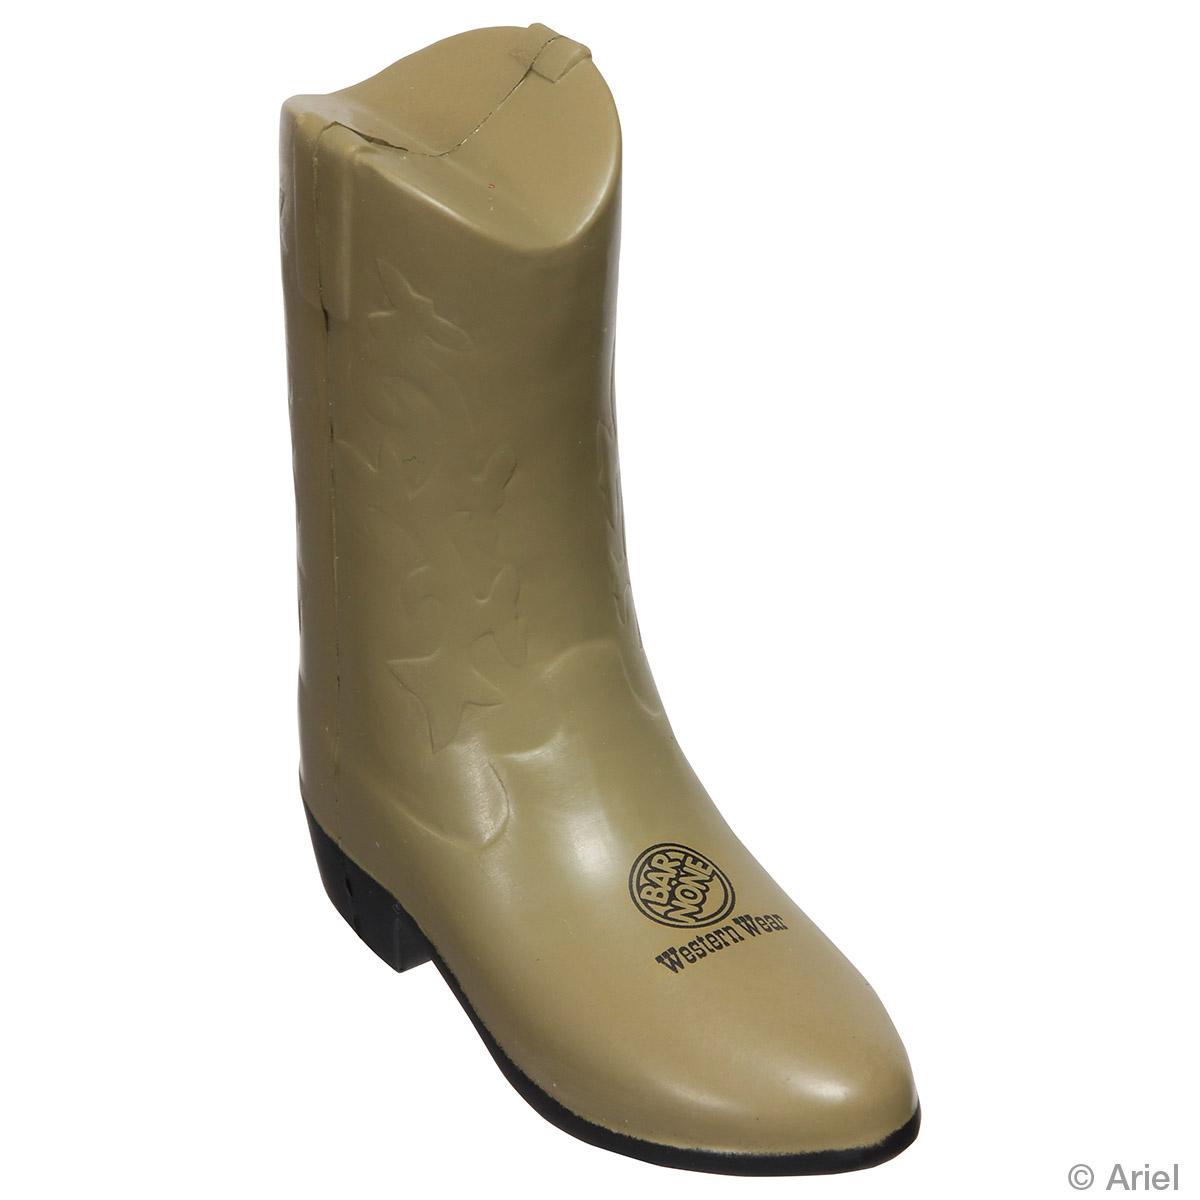 Cowboy Boot Stress Reliever, LWE-CB88 - 1 Colour Imprint